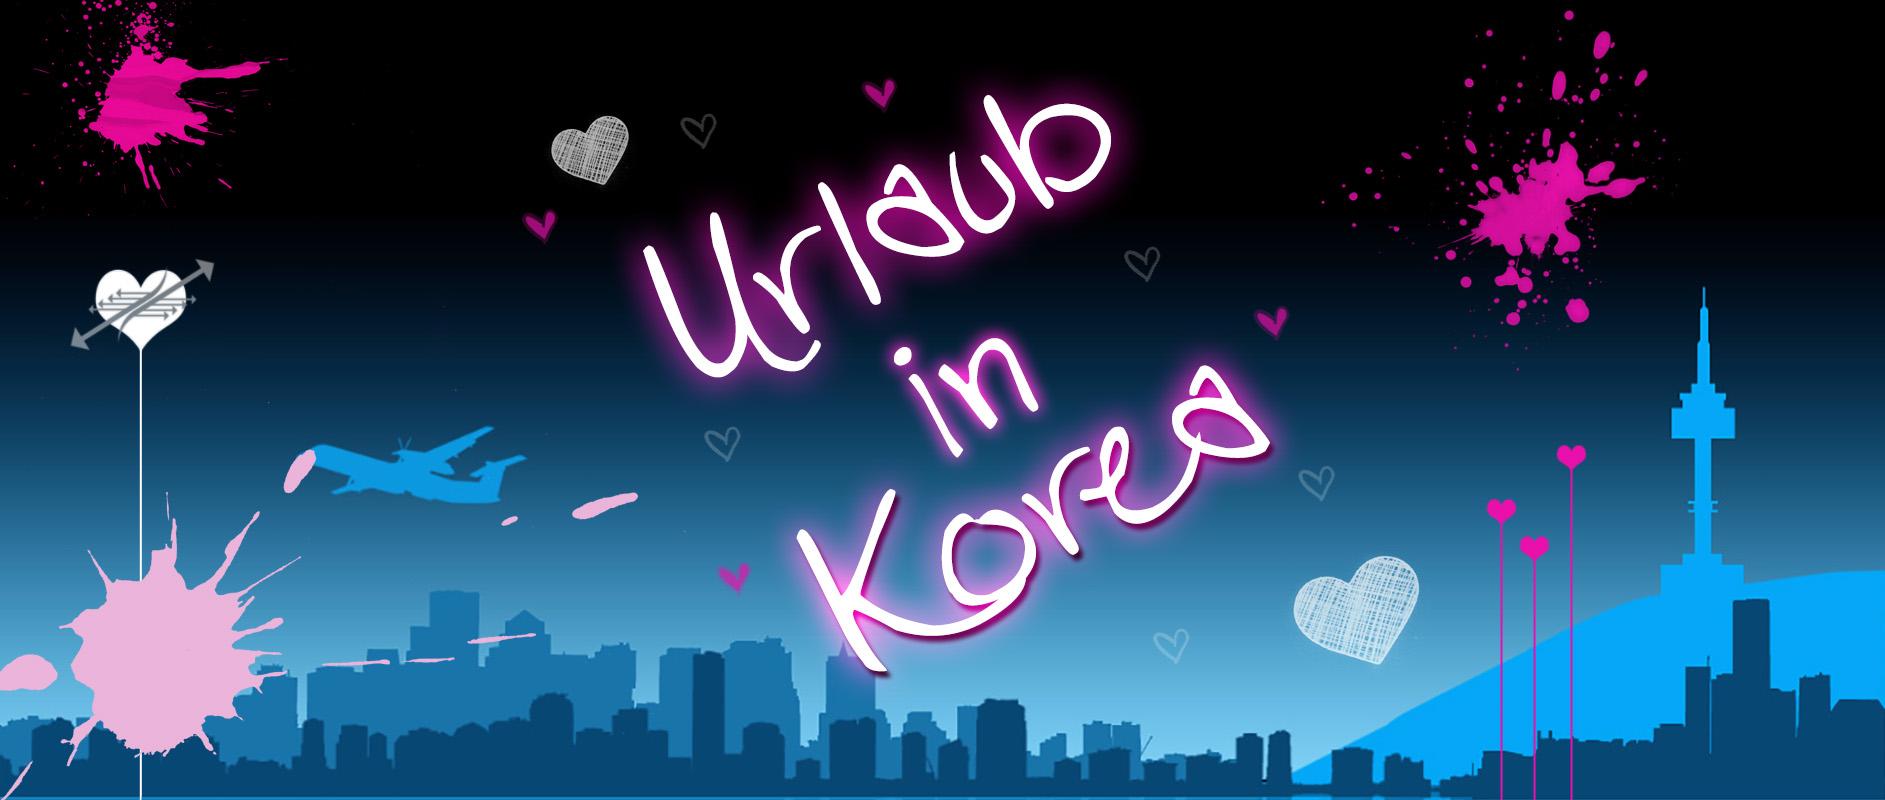 Urlaub in Korea